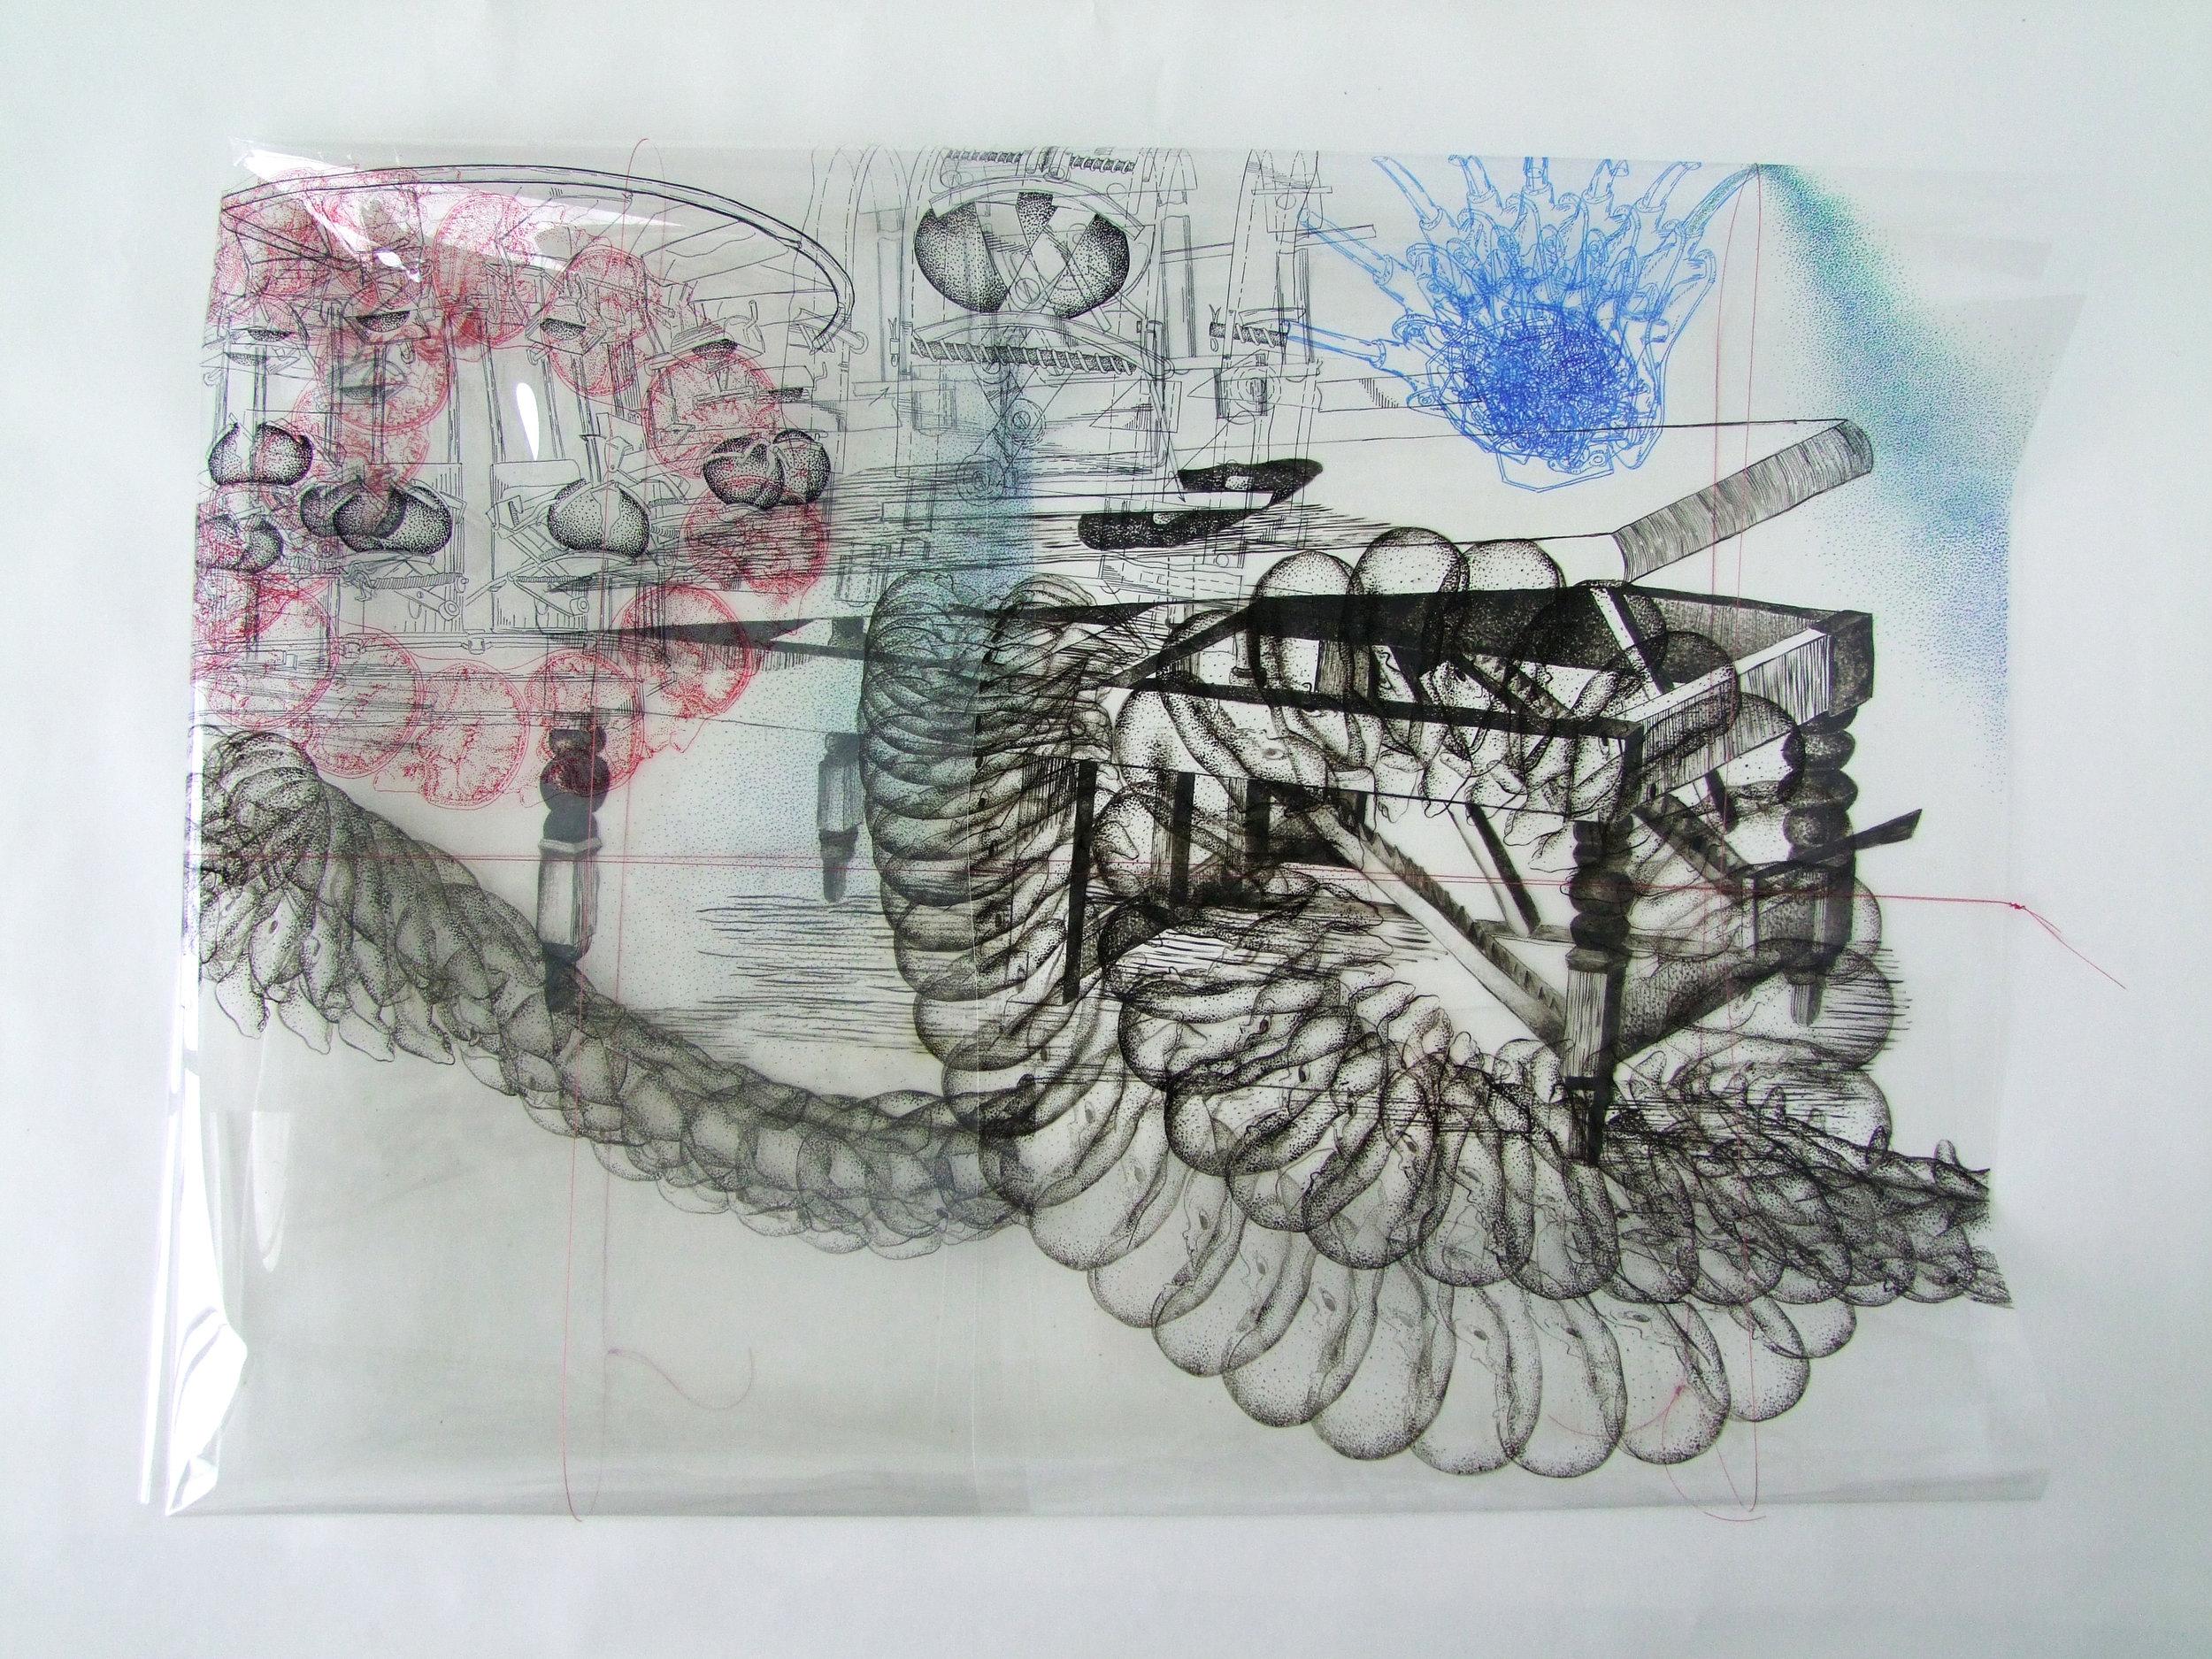 Egg Breaker , folded in 35x40 inch, permanent marker, Vitrail paint, fishing line and dust on duralar sheet, 2017